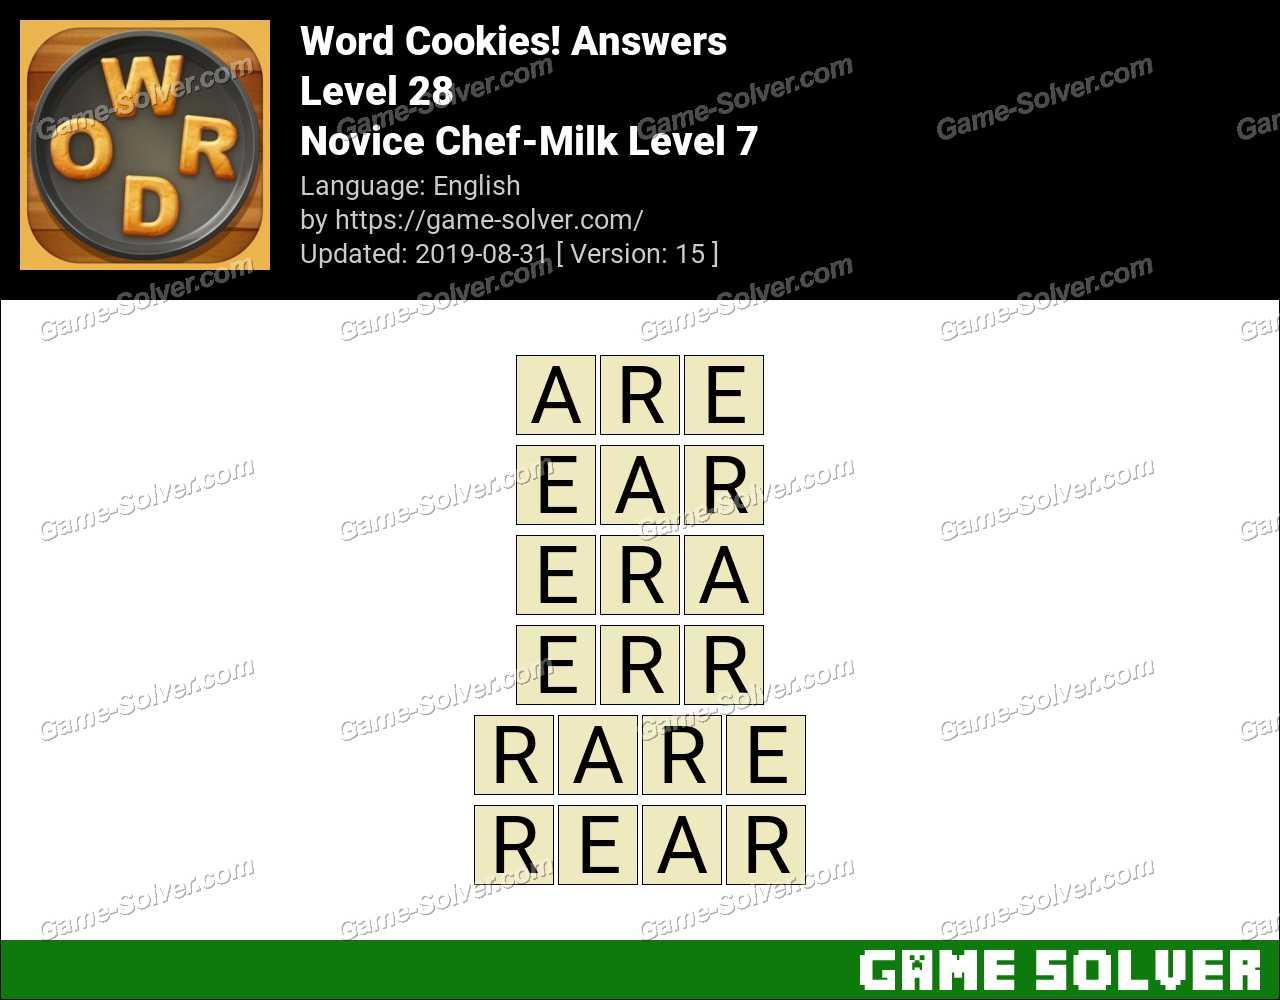 Word Cookies Novice Chef-Milk Level 7 Answers